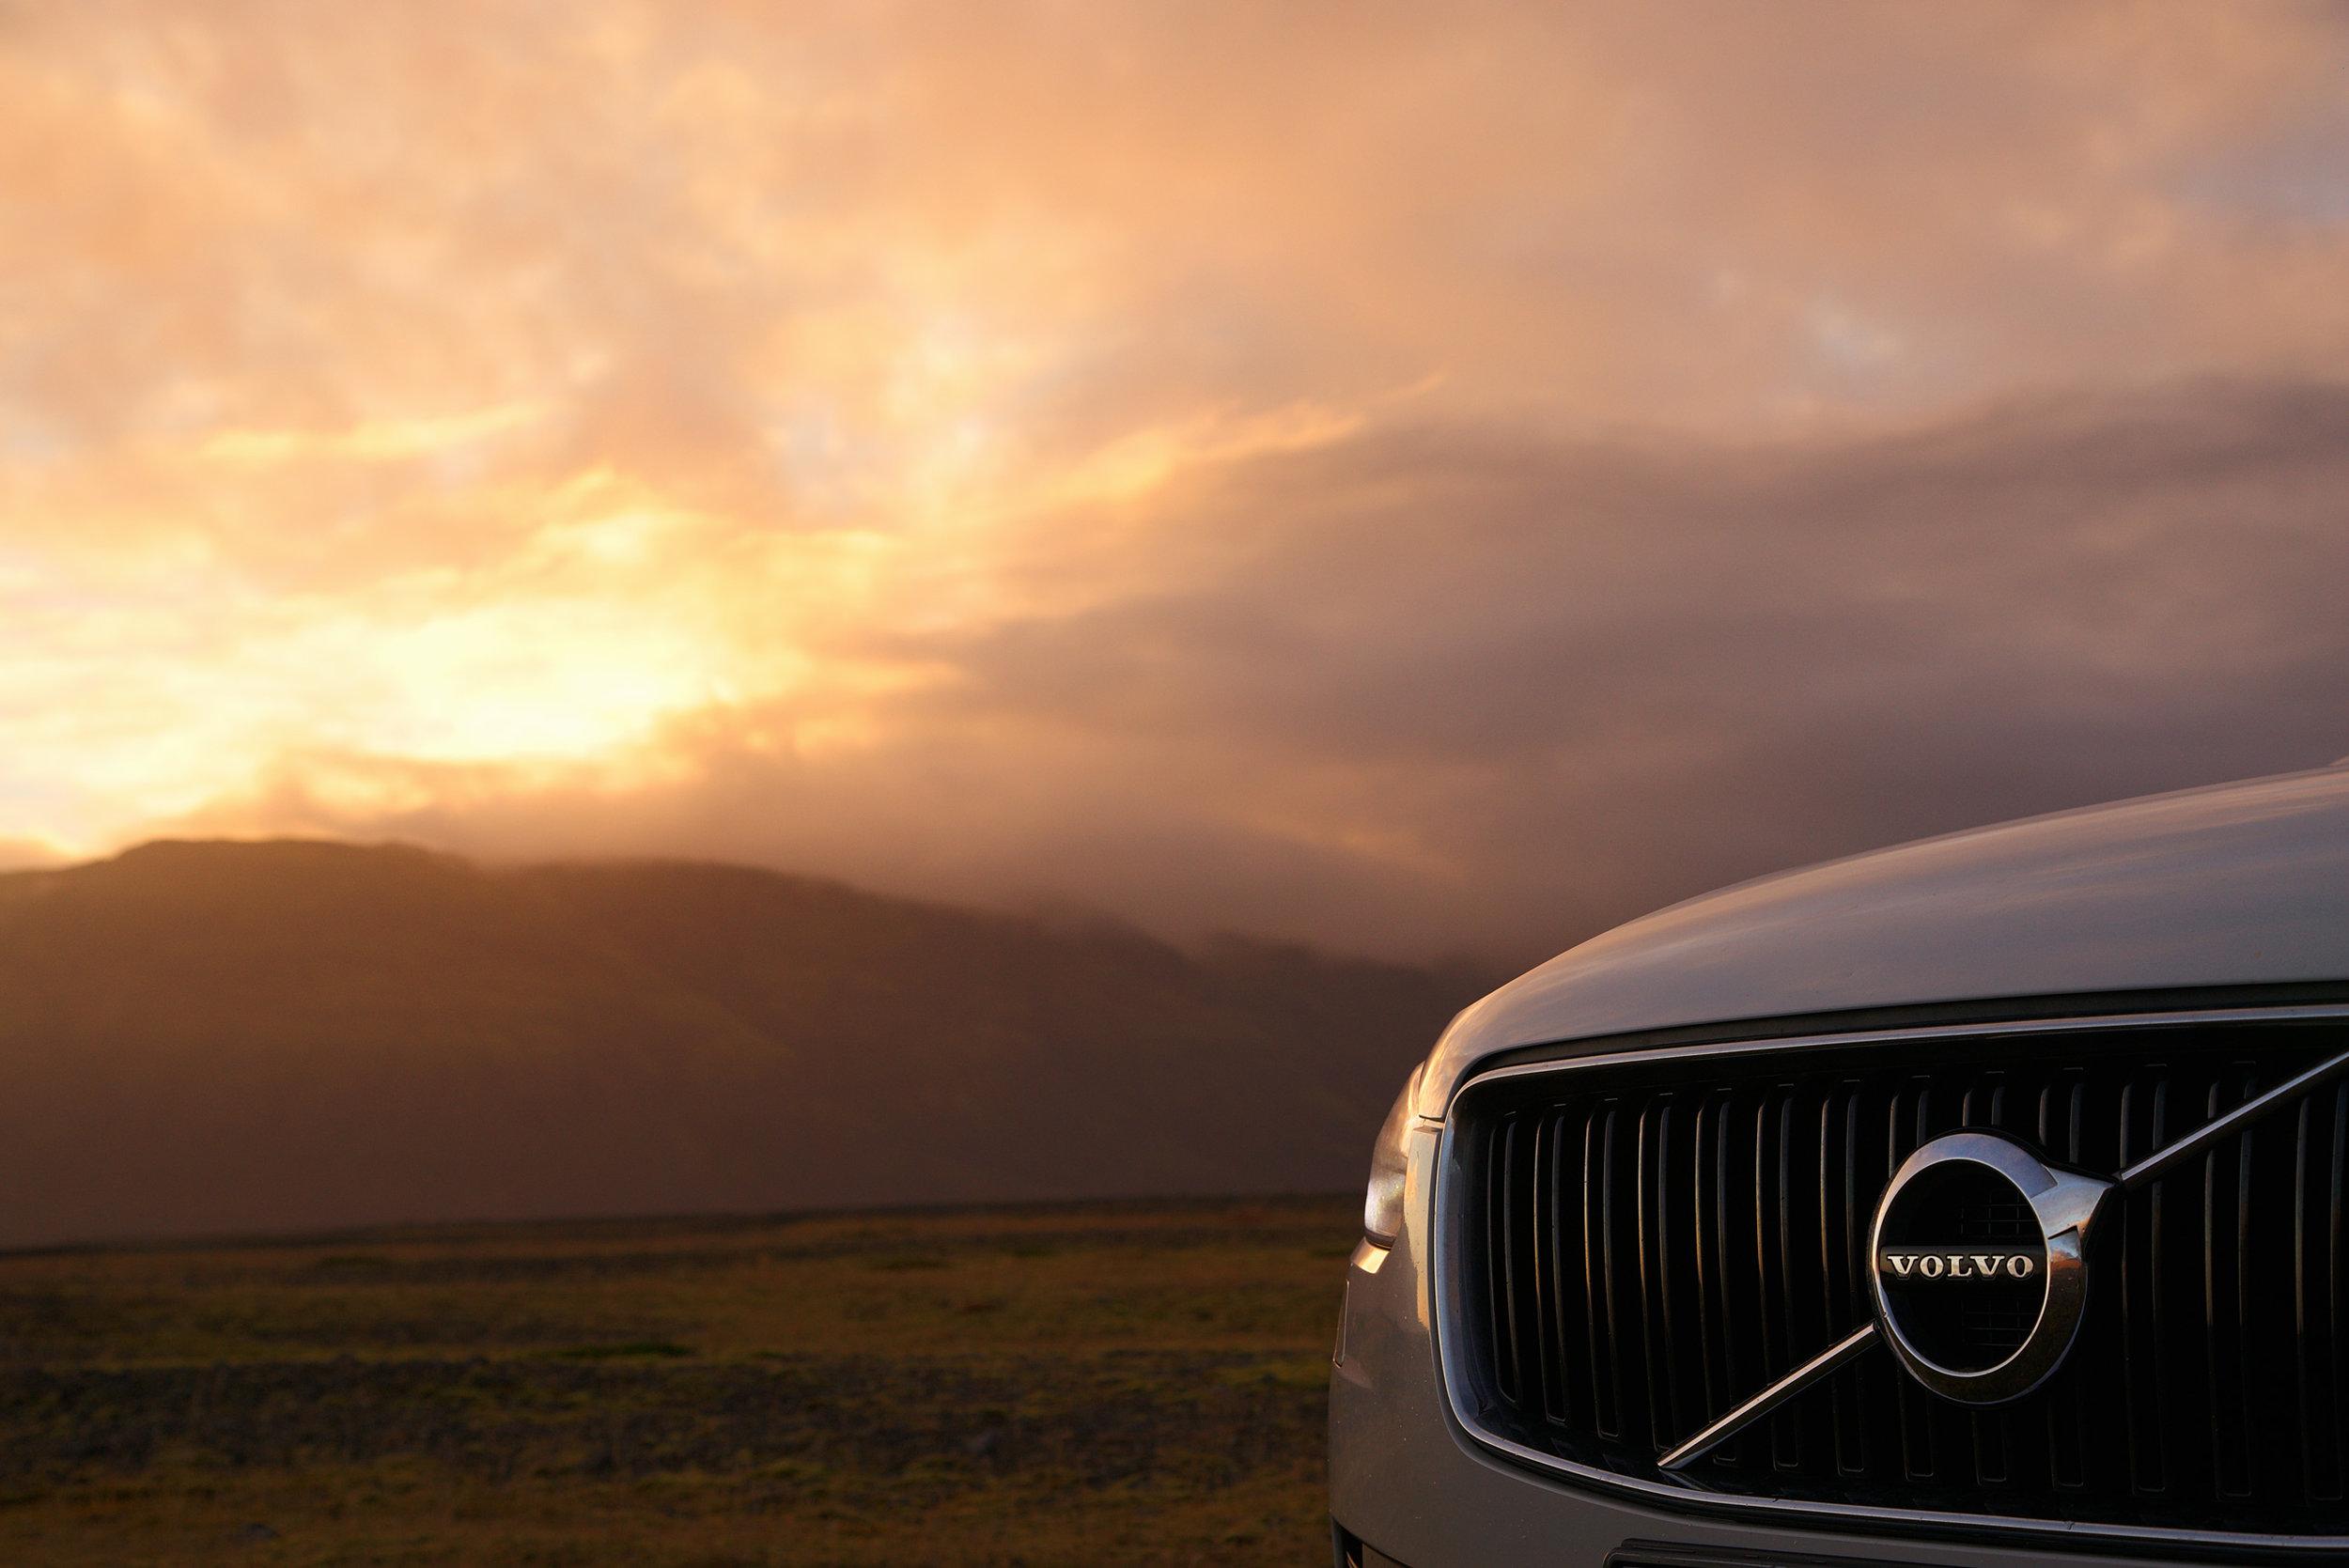 Volvo_Logo_Iceland_Sunset.jpg